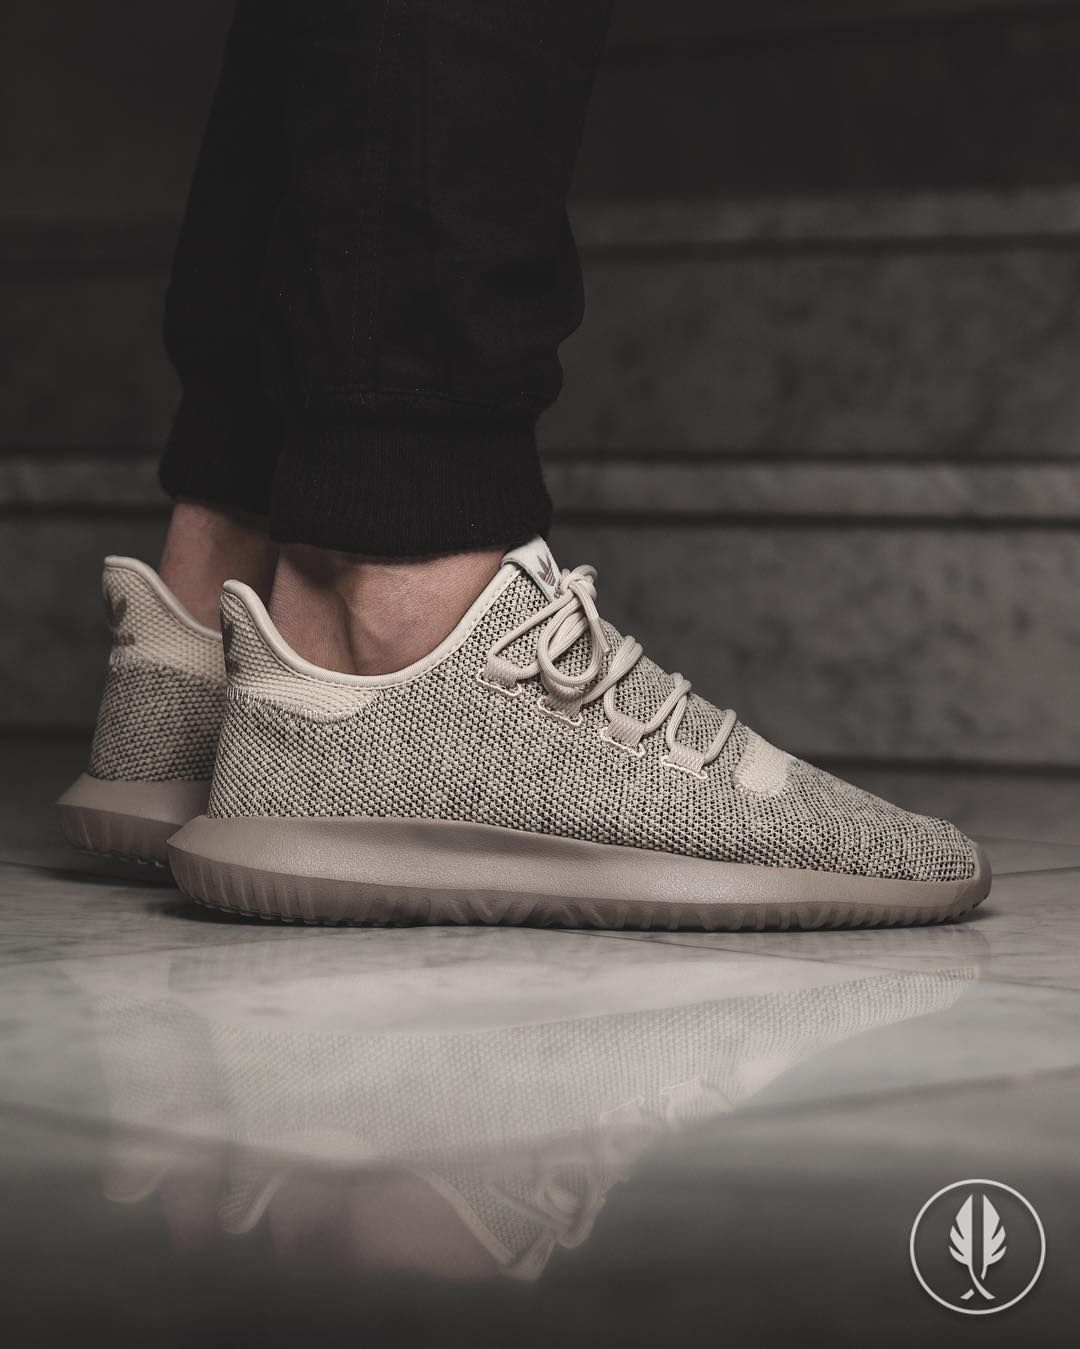 dcbbf50c4ed adidas yeezy boost release date adidas tubular shadow knit